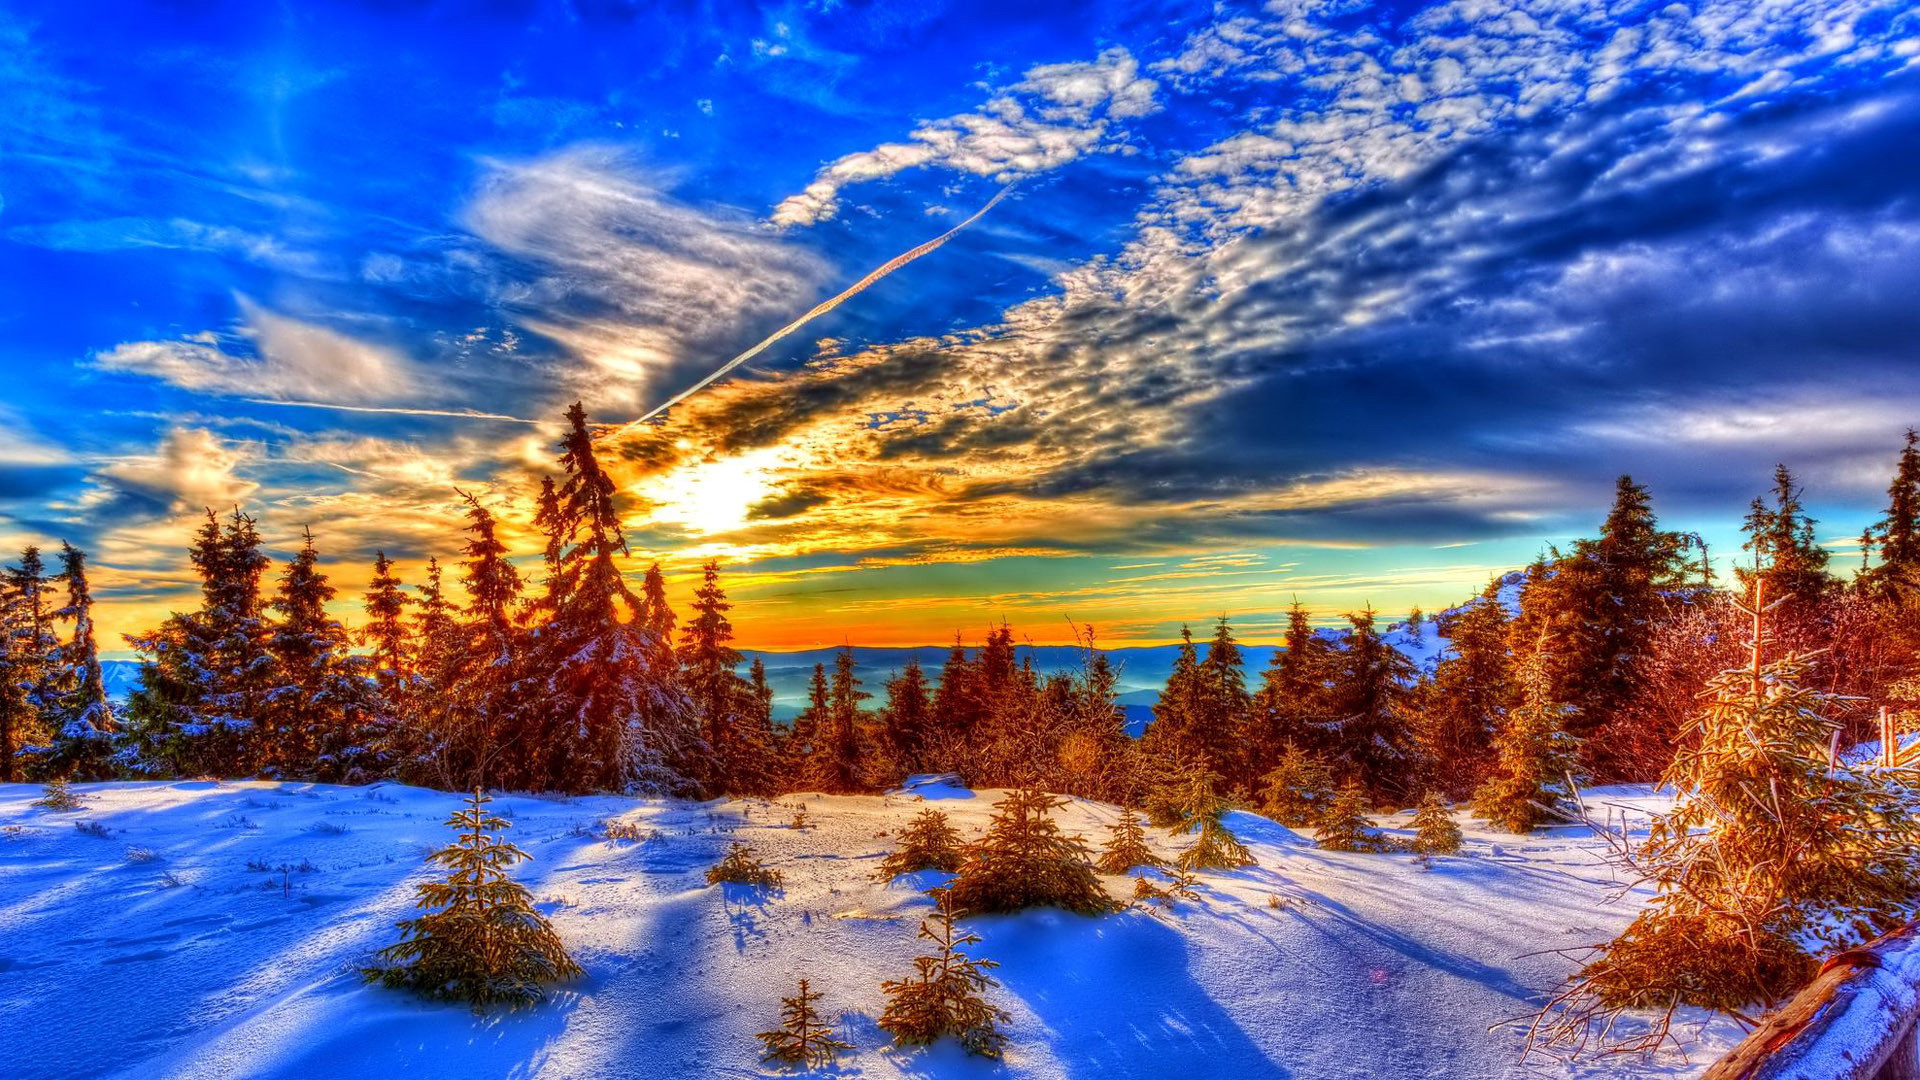 Download Winter Sunset HD Wallpapers Desktop Backgrounds in HD High .